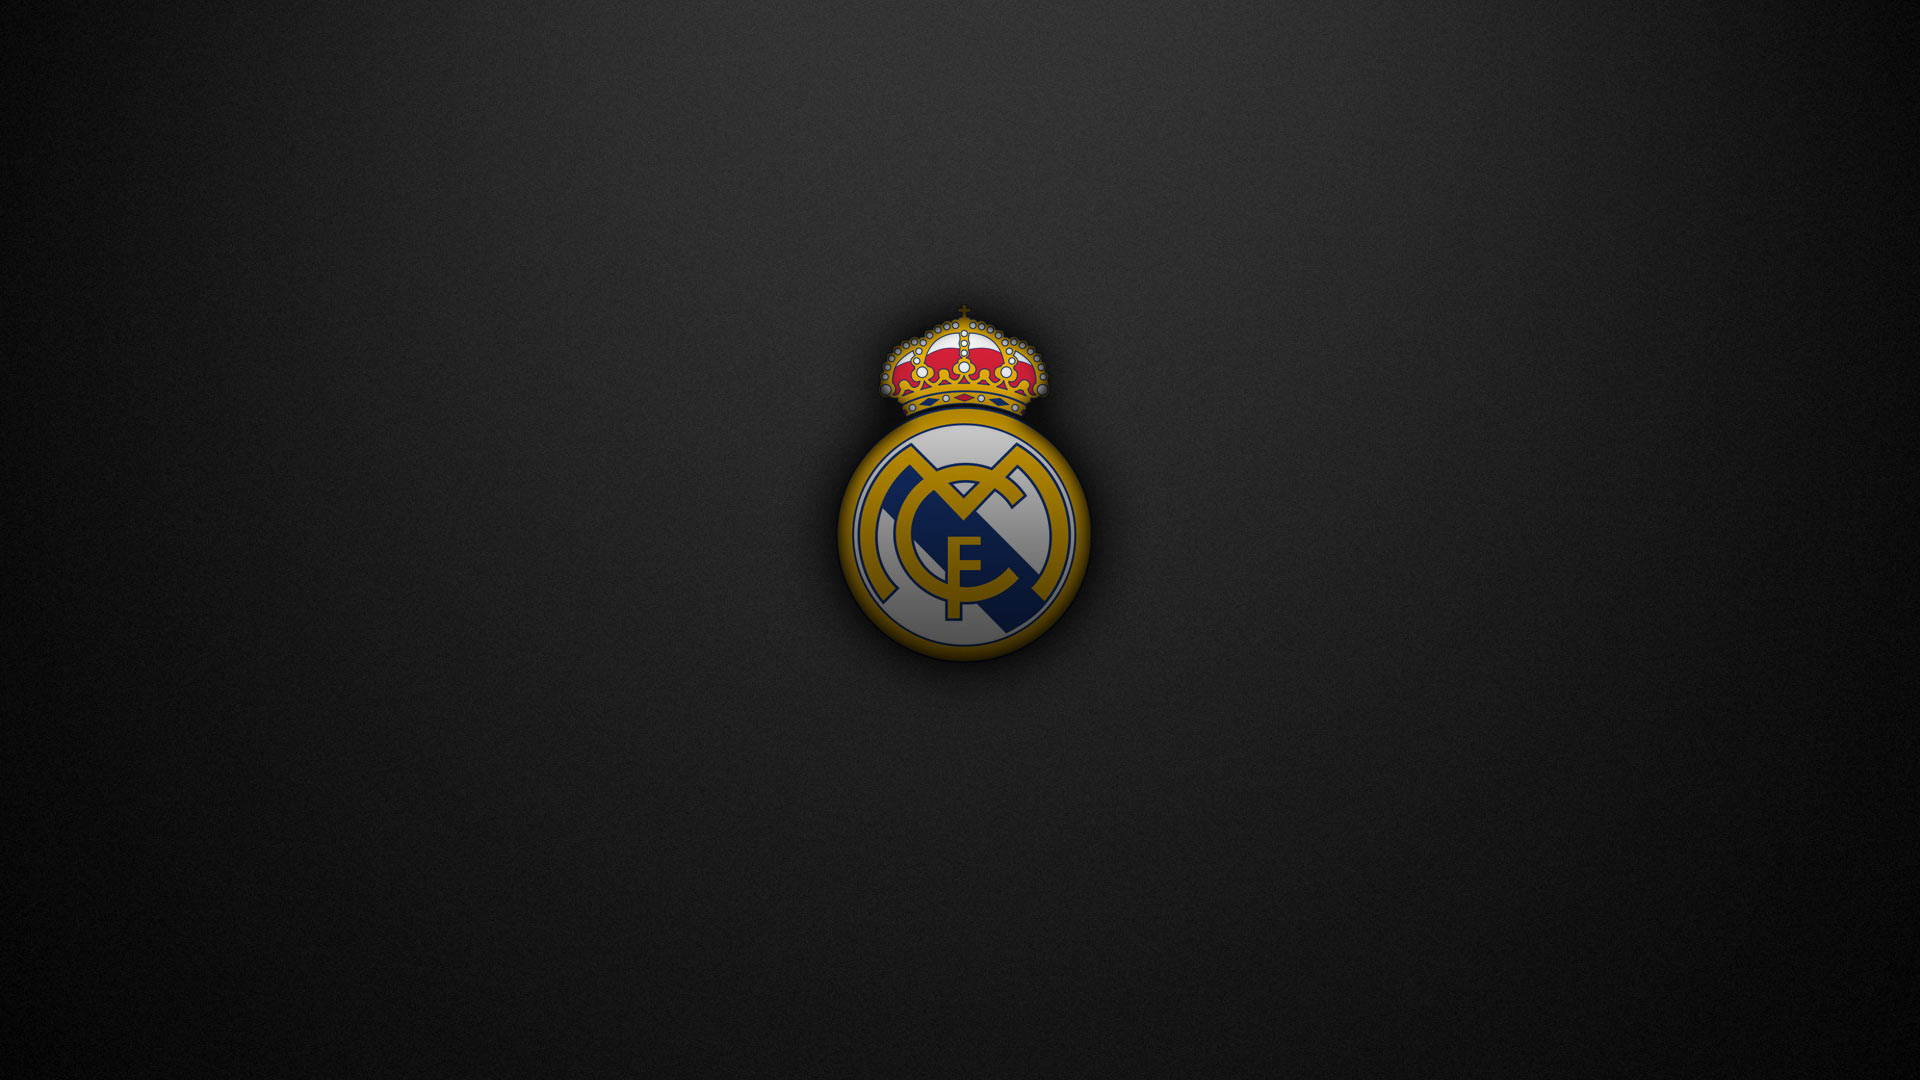 45 Football Hd Wallpapers 1080p On Wallpapersafari